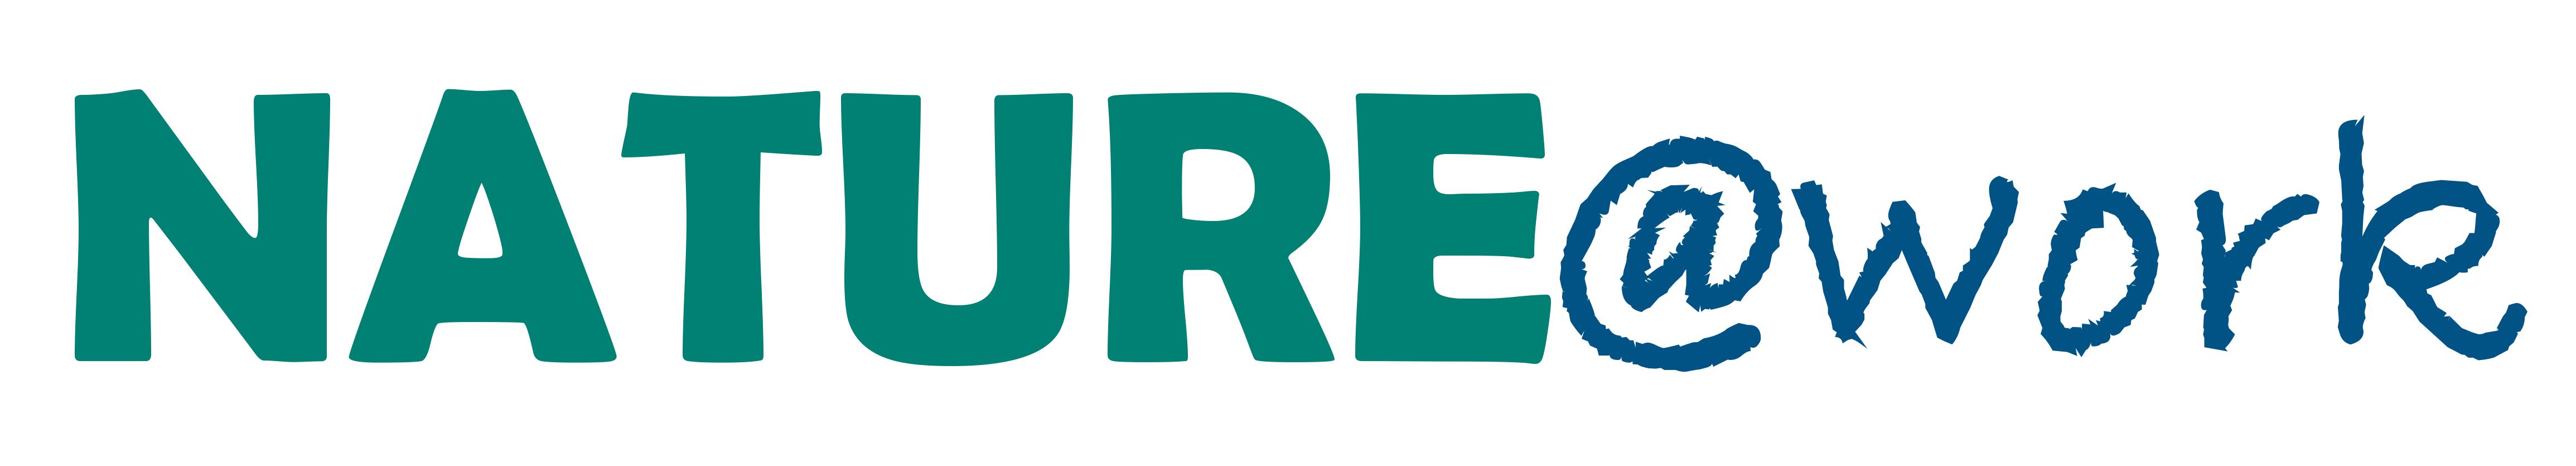 NATURE@work logo